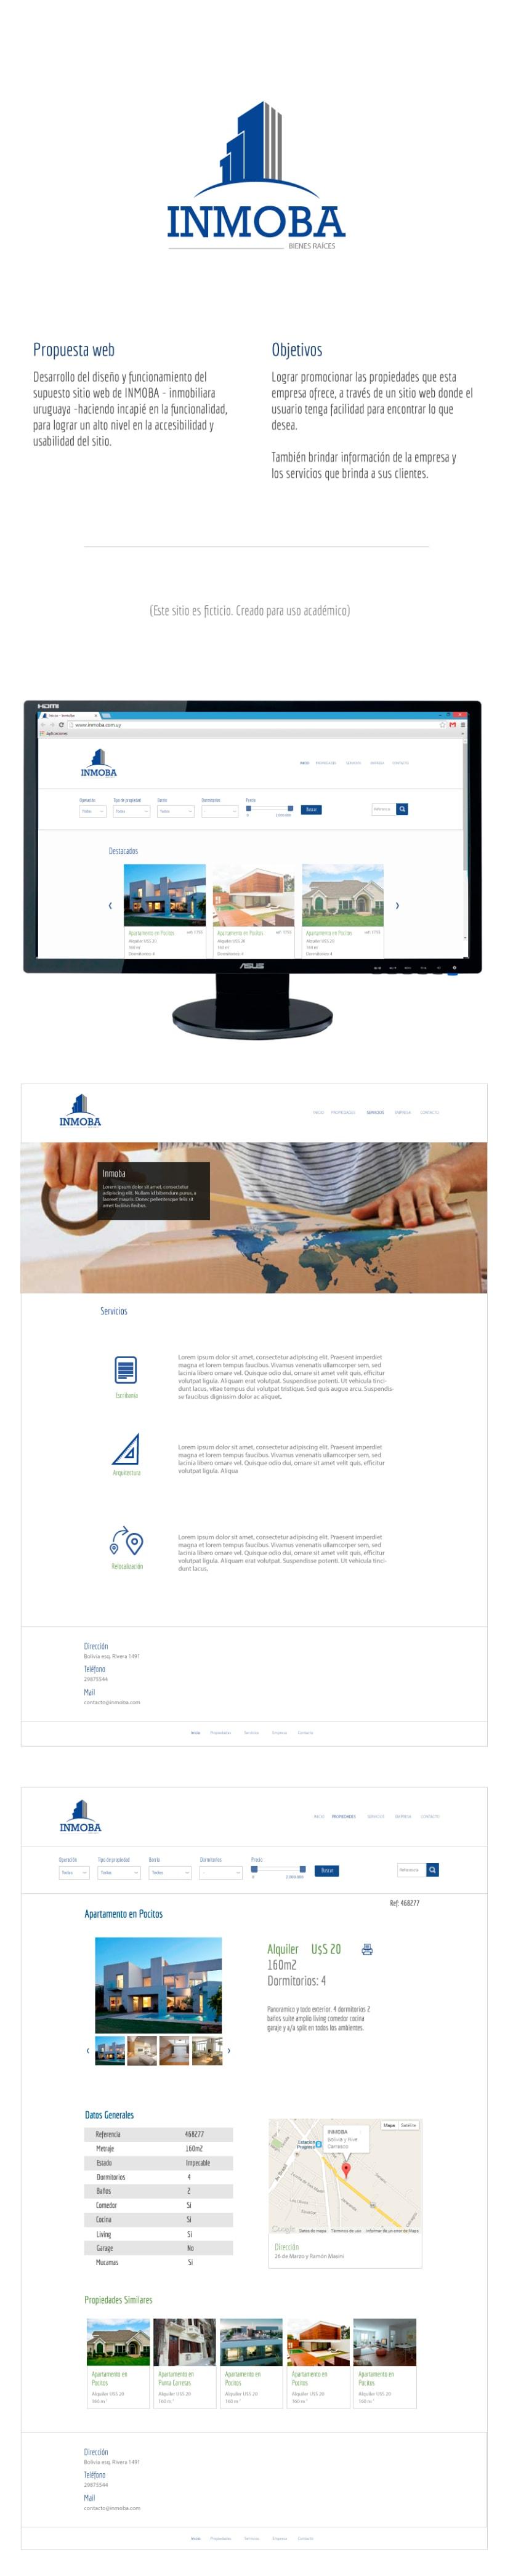 Inmoba - diseño web -1